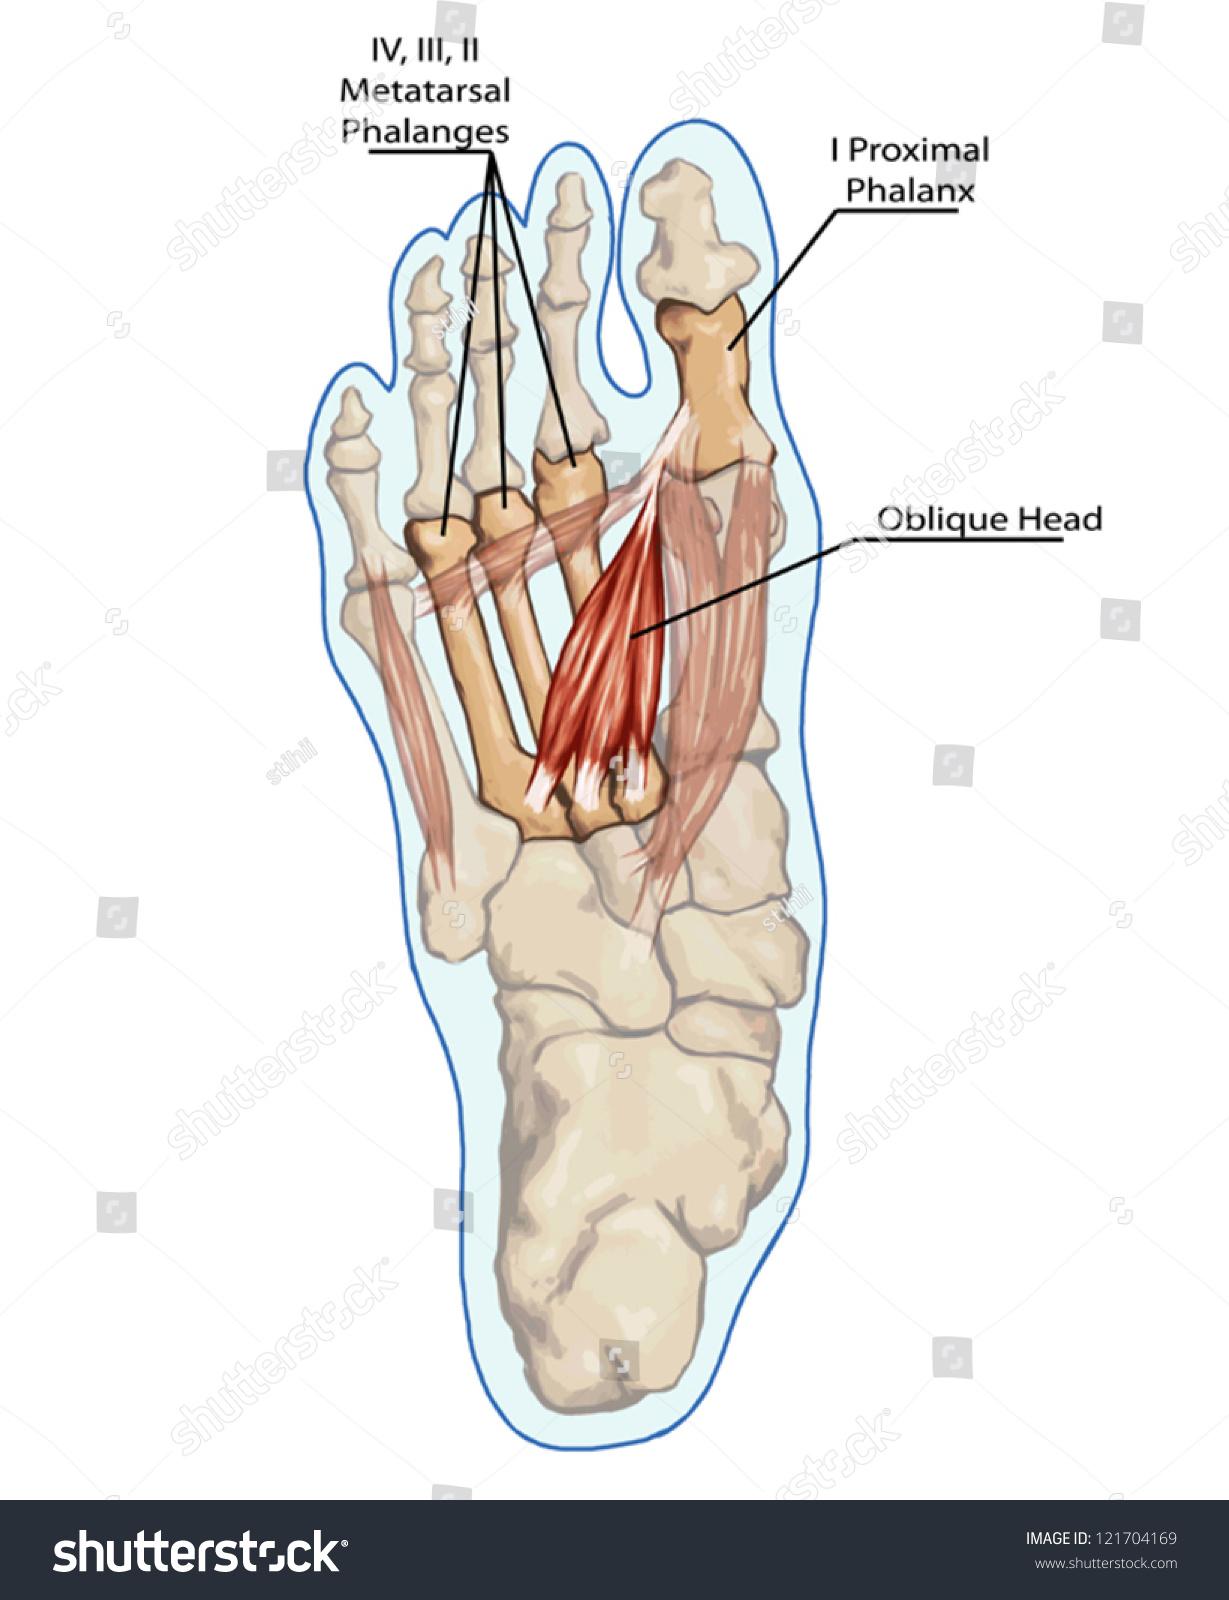 Oblique Head Anatomy Leg Foot Human Stock Vector (Royalty Free ...